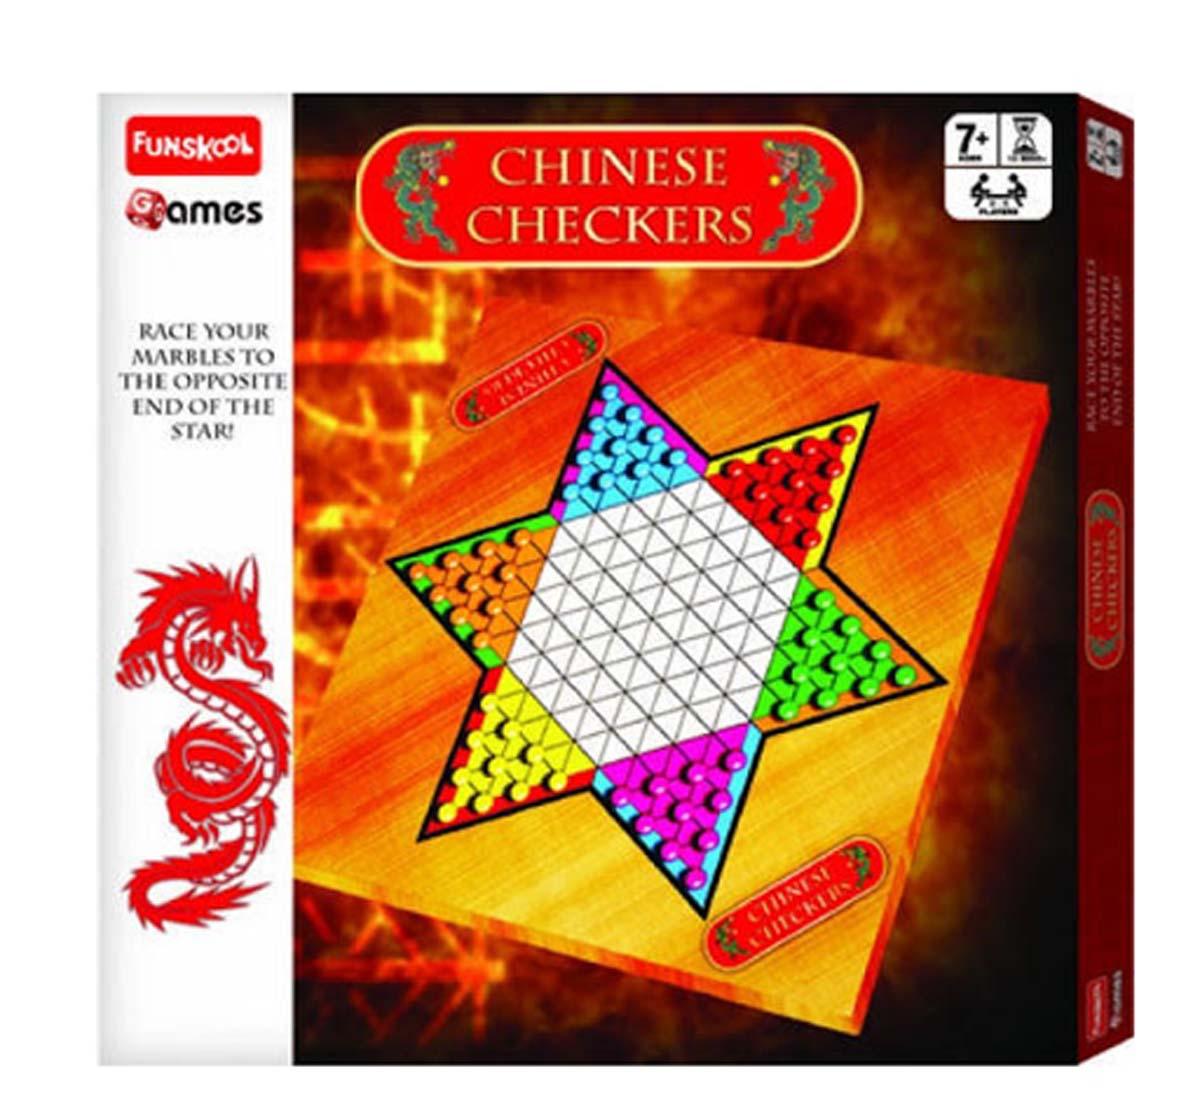 Funskool | Funskool Chinese Checkers - Board Game Board Games for Kids Age 7Y+